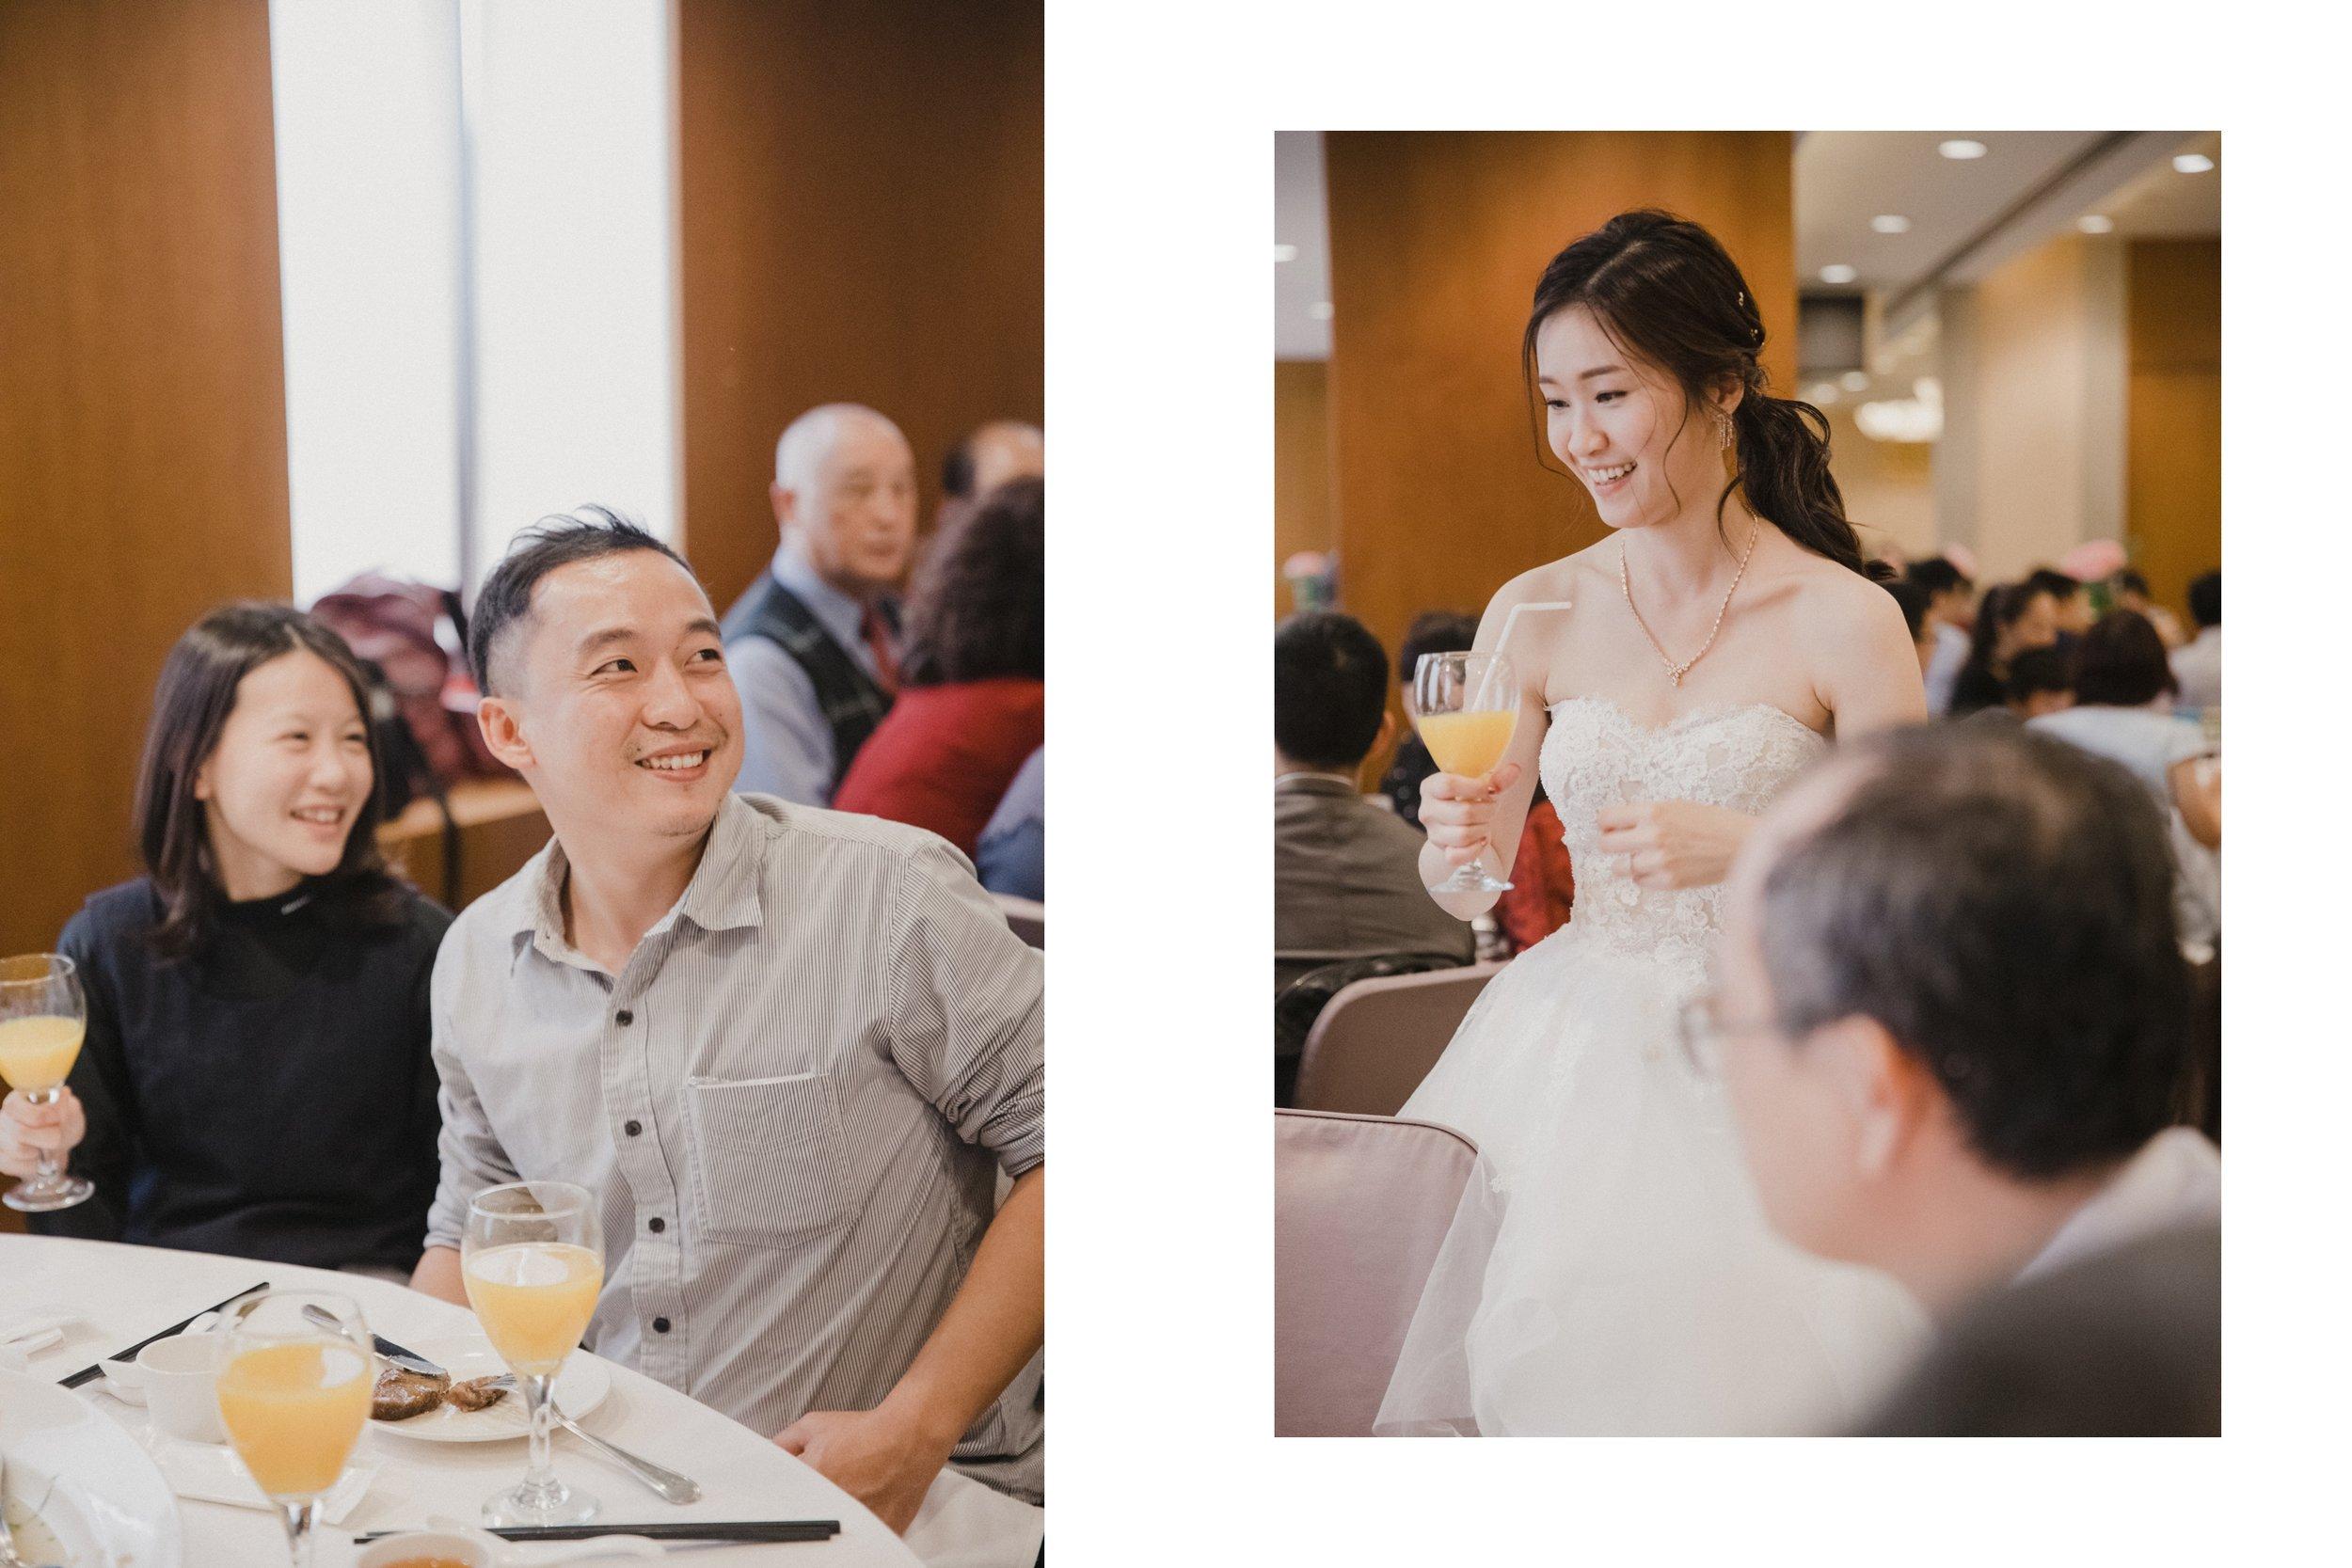 wedding-caridee-oscar-lunch-ambassador-hsinchu-結婚午宴-新竹國賓_132.jpg